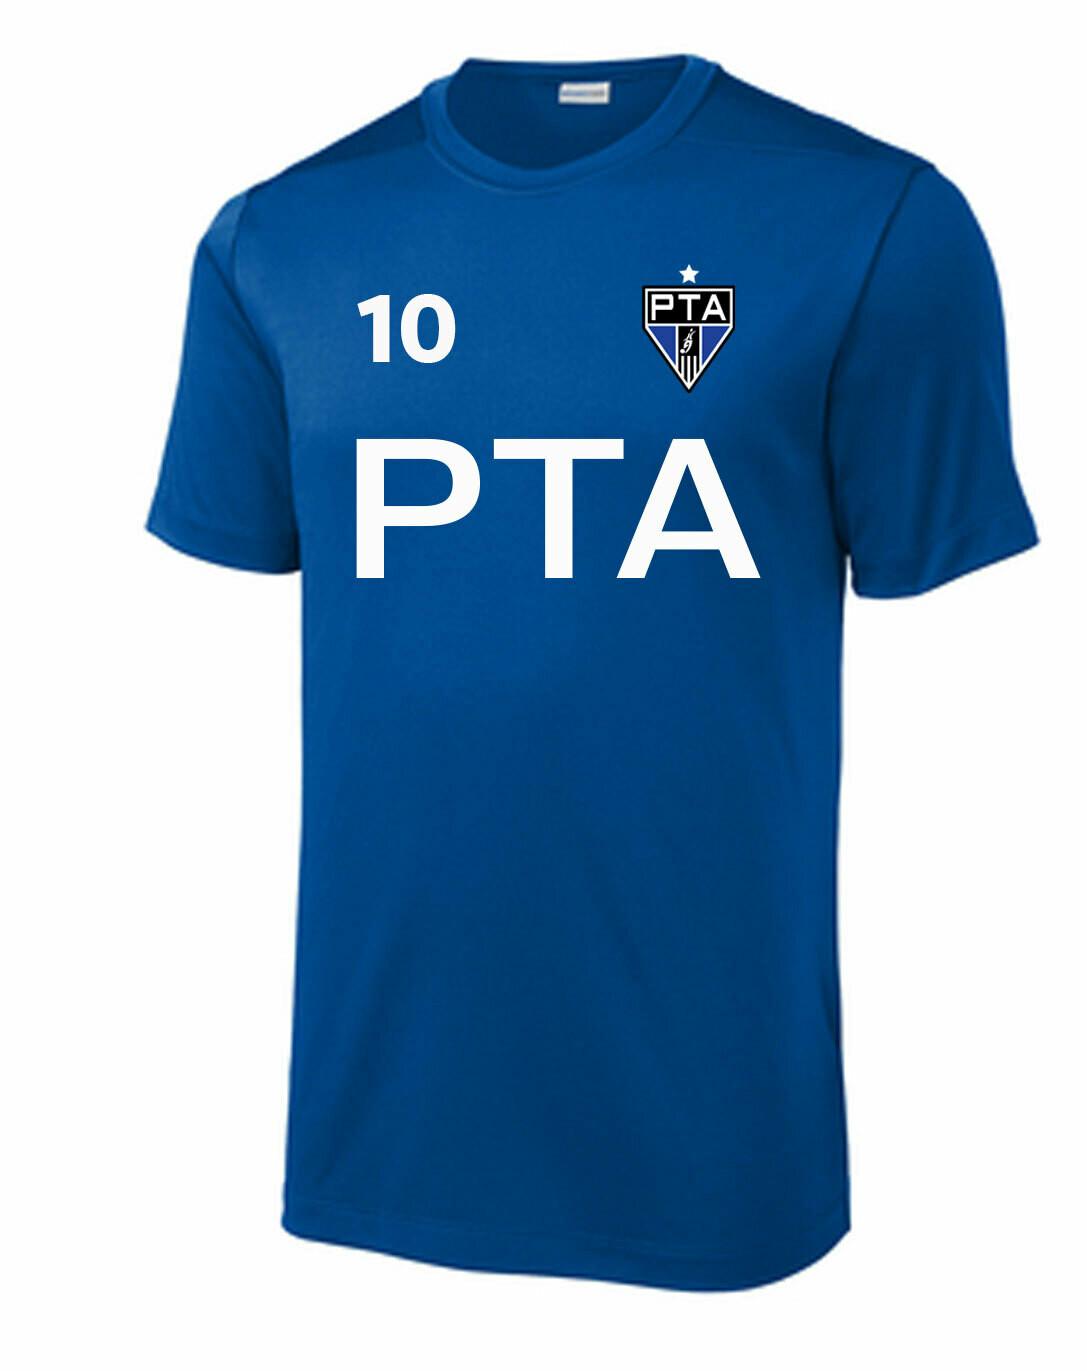 PTA Home Jersey